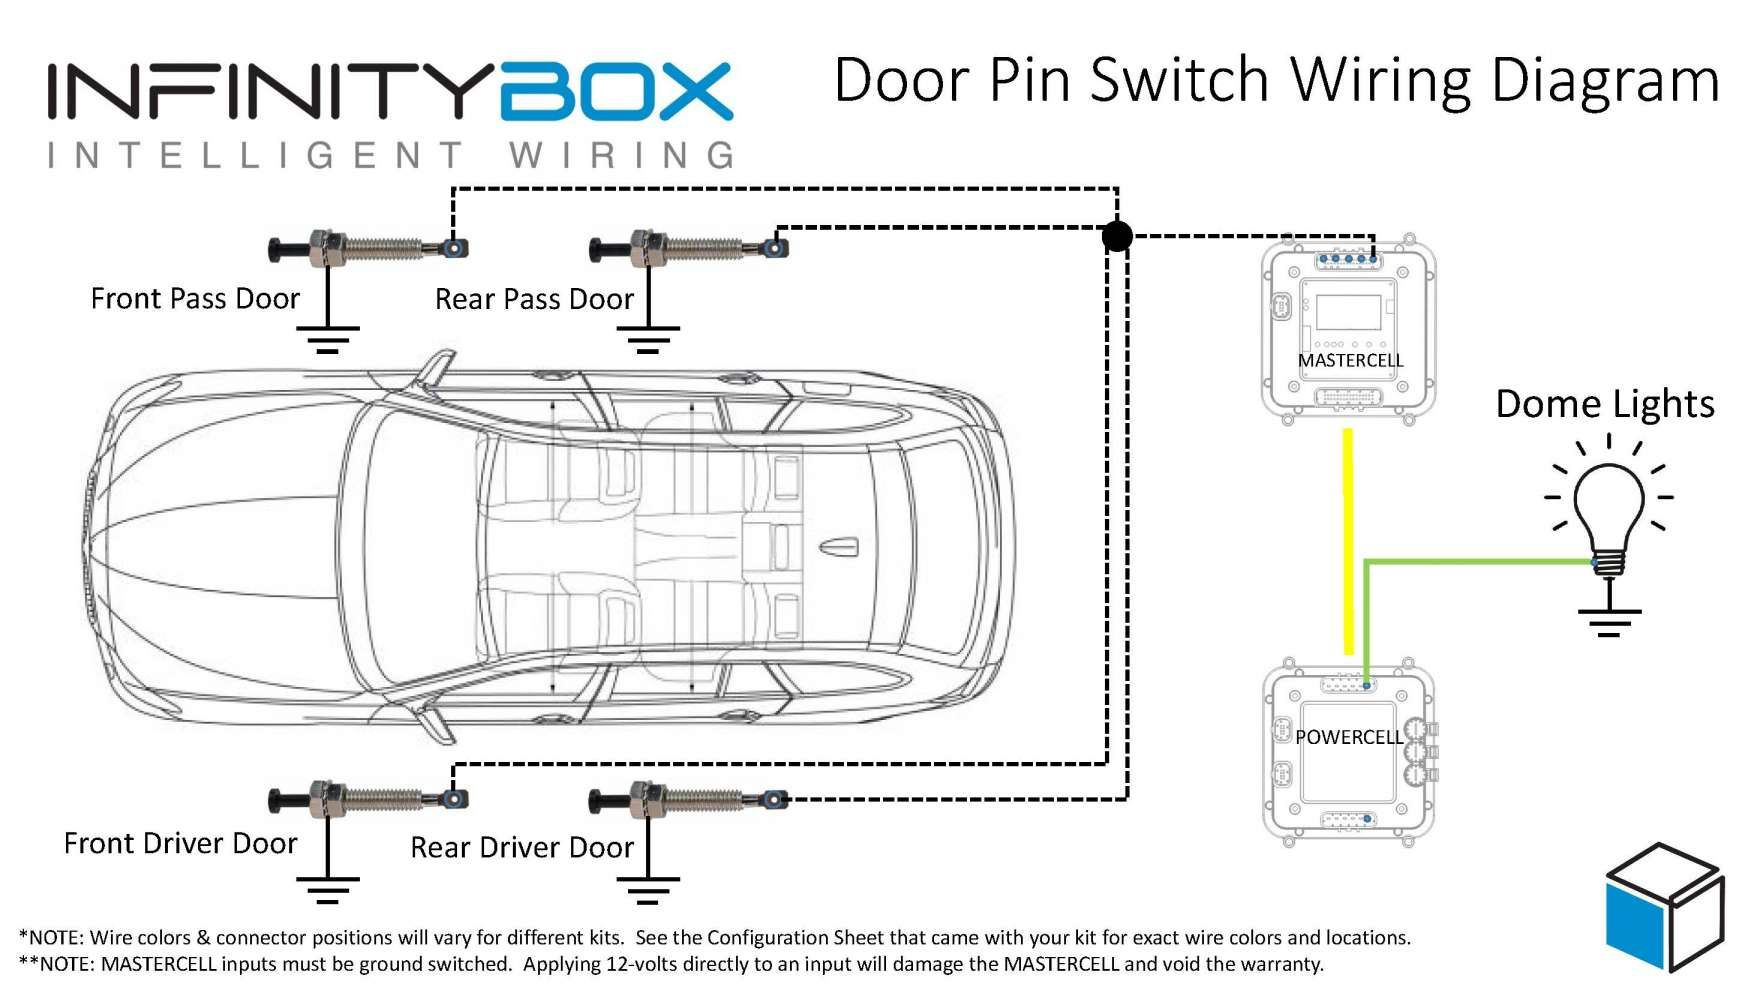 16 Car Door Switch Wiring Diagram Car Diagram Wiringg Net Door Switch Car Door Light Switch Wiring